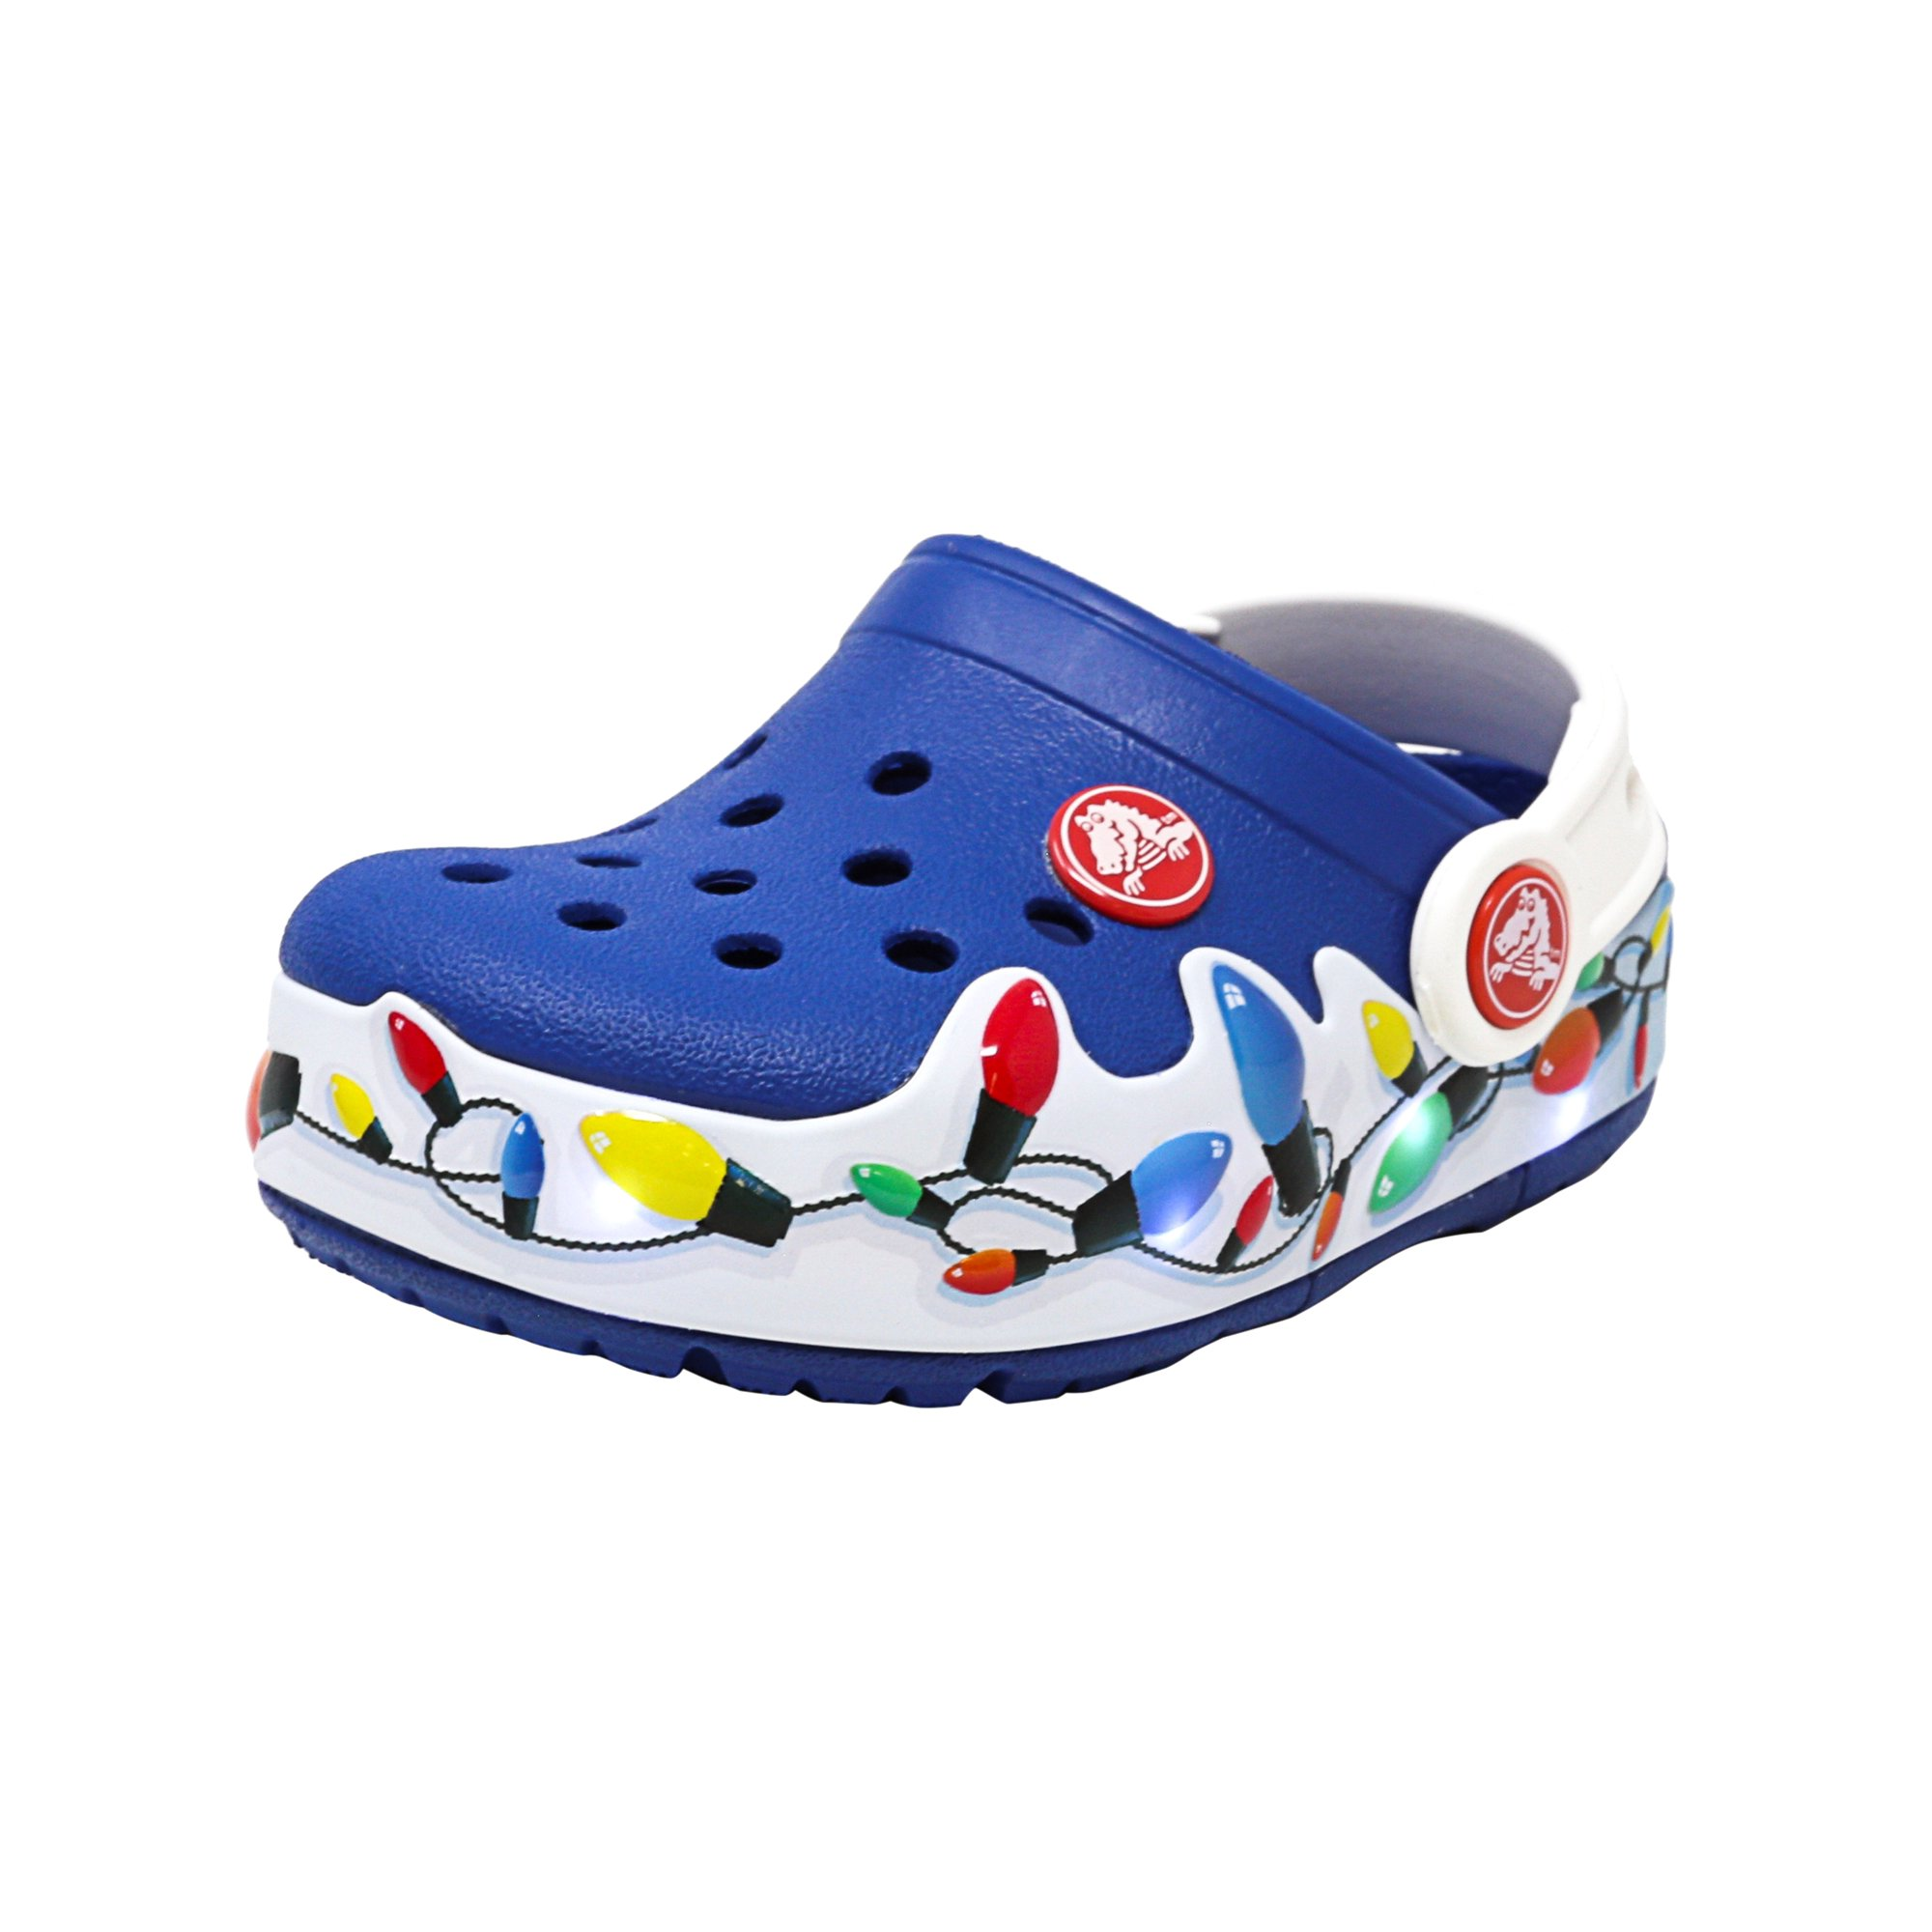 d141ffb6e9fc Buy Crocs Crocslights Holiday Clog Blue Jean Ankle-High Clogs - 9M ...